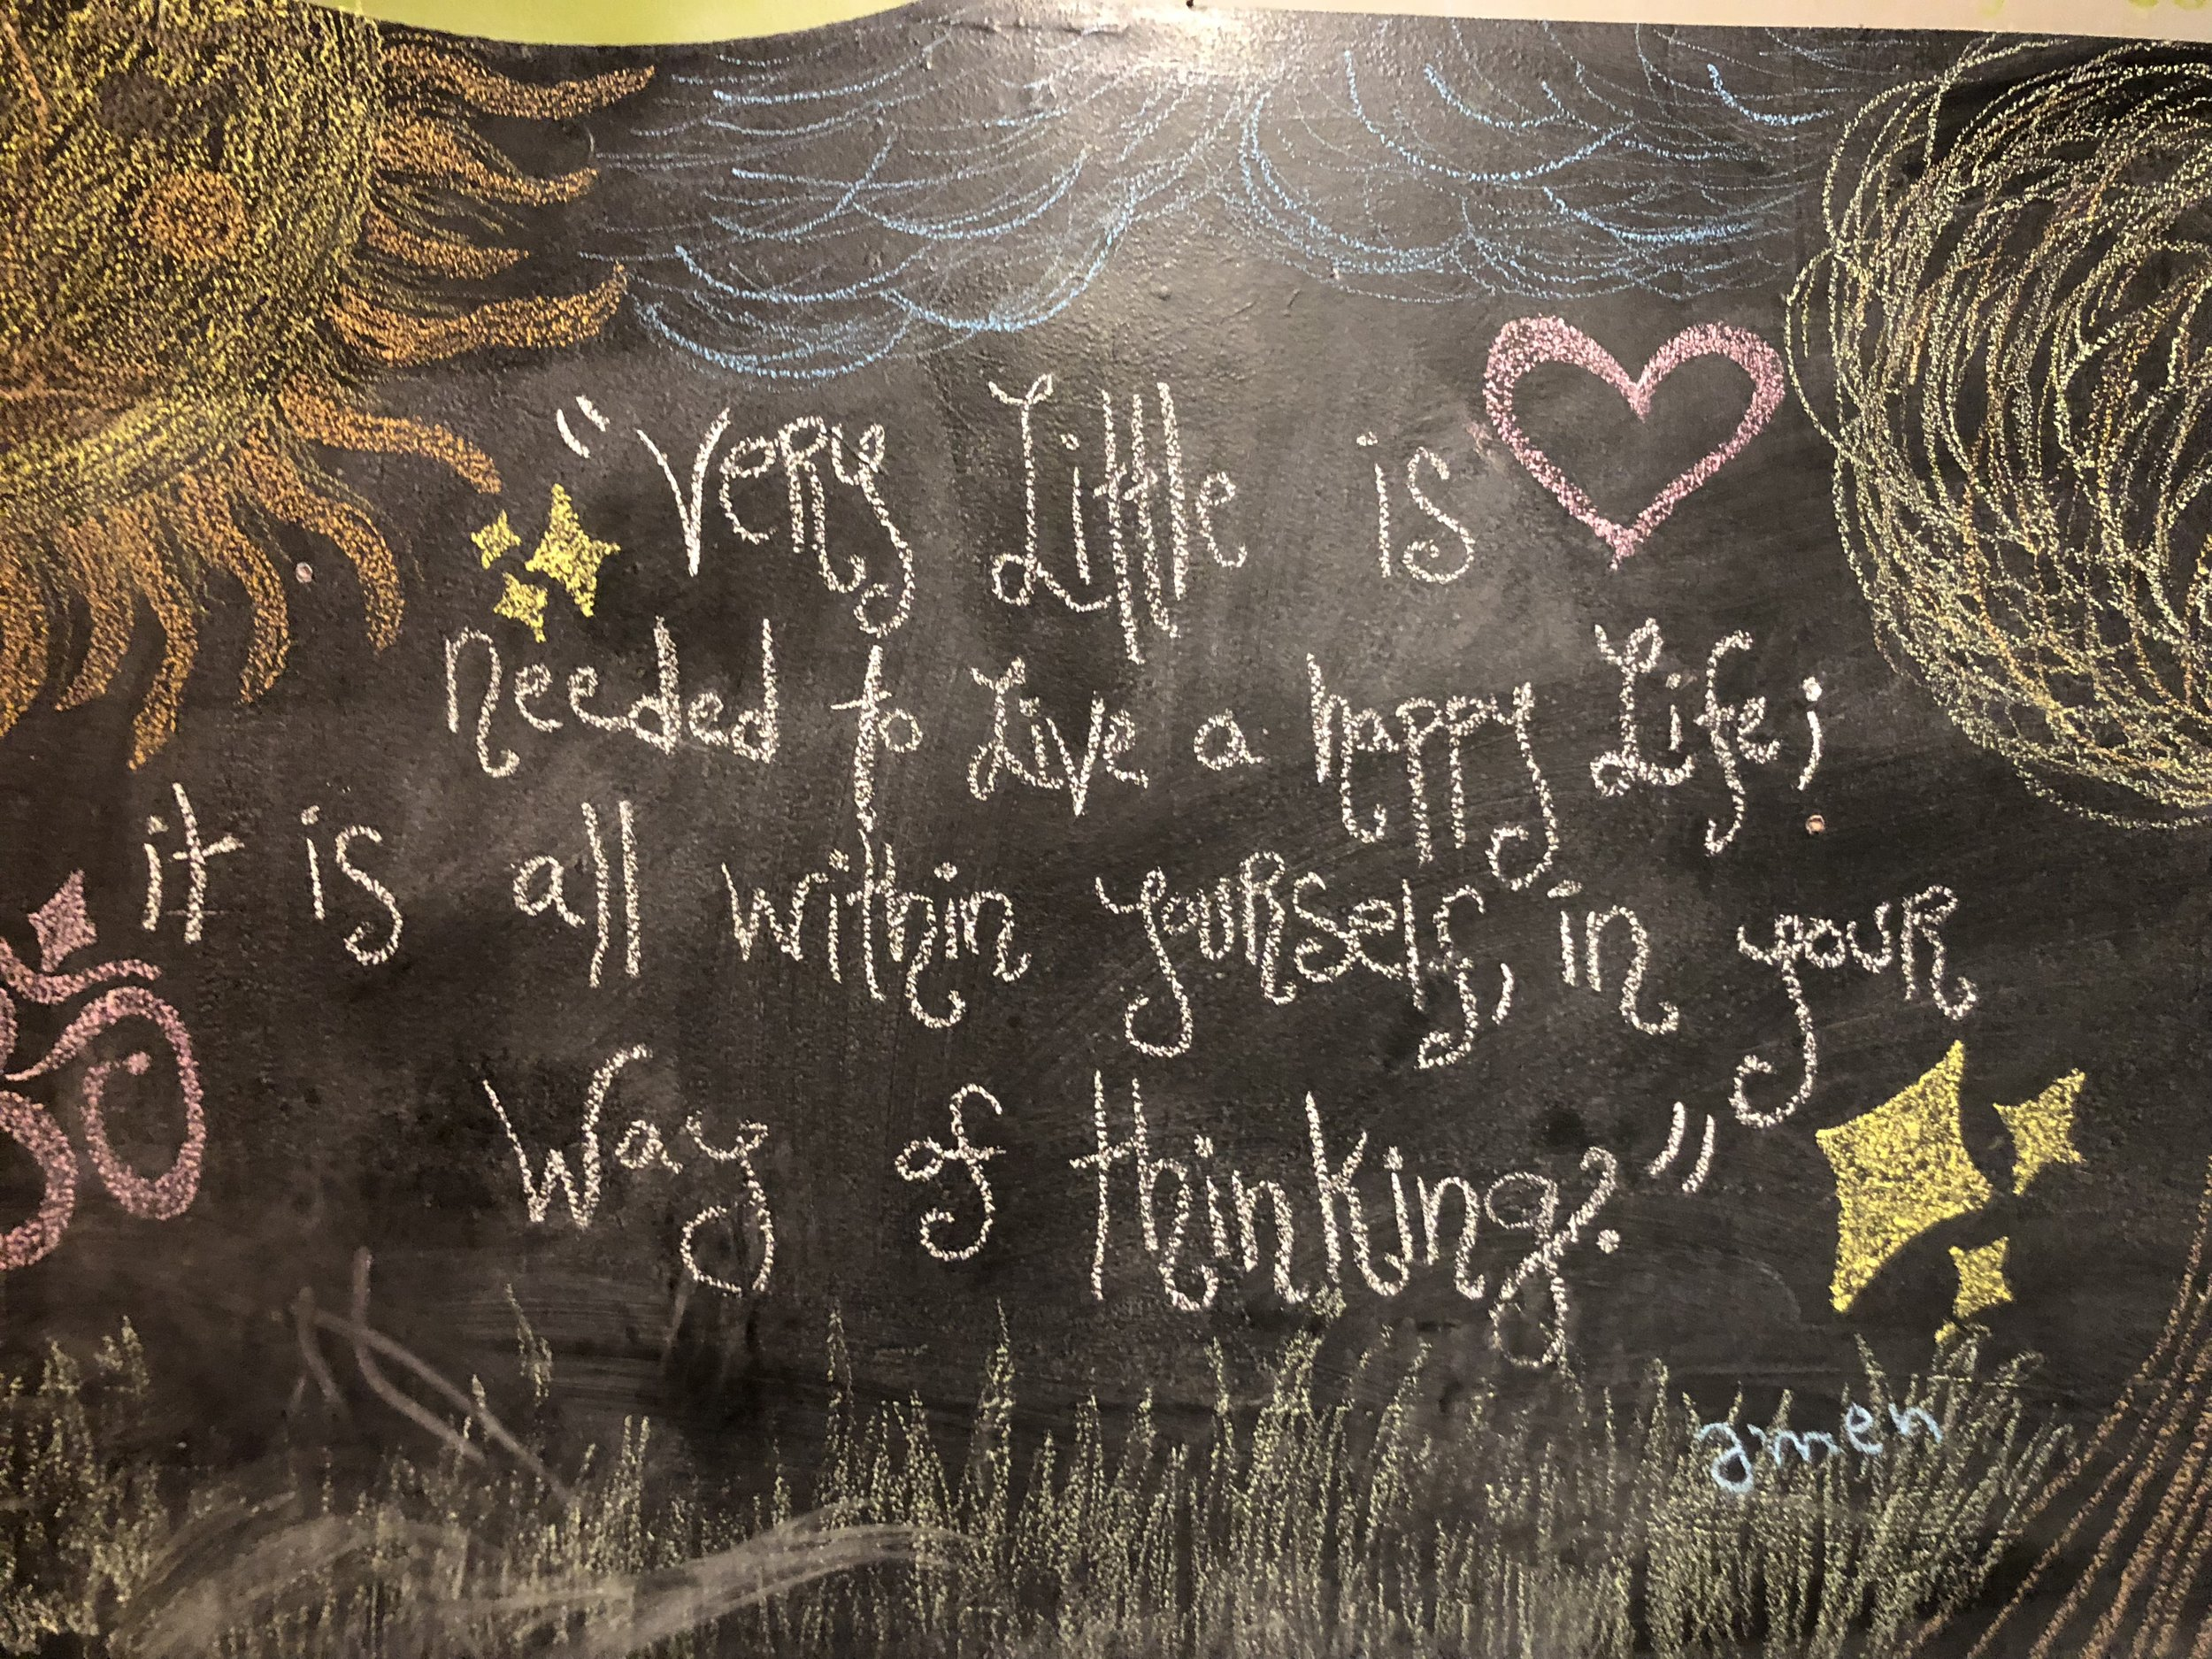 Chalkboard Art at Mead's Green Door Cafe